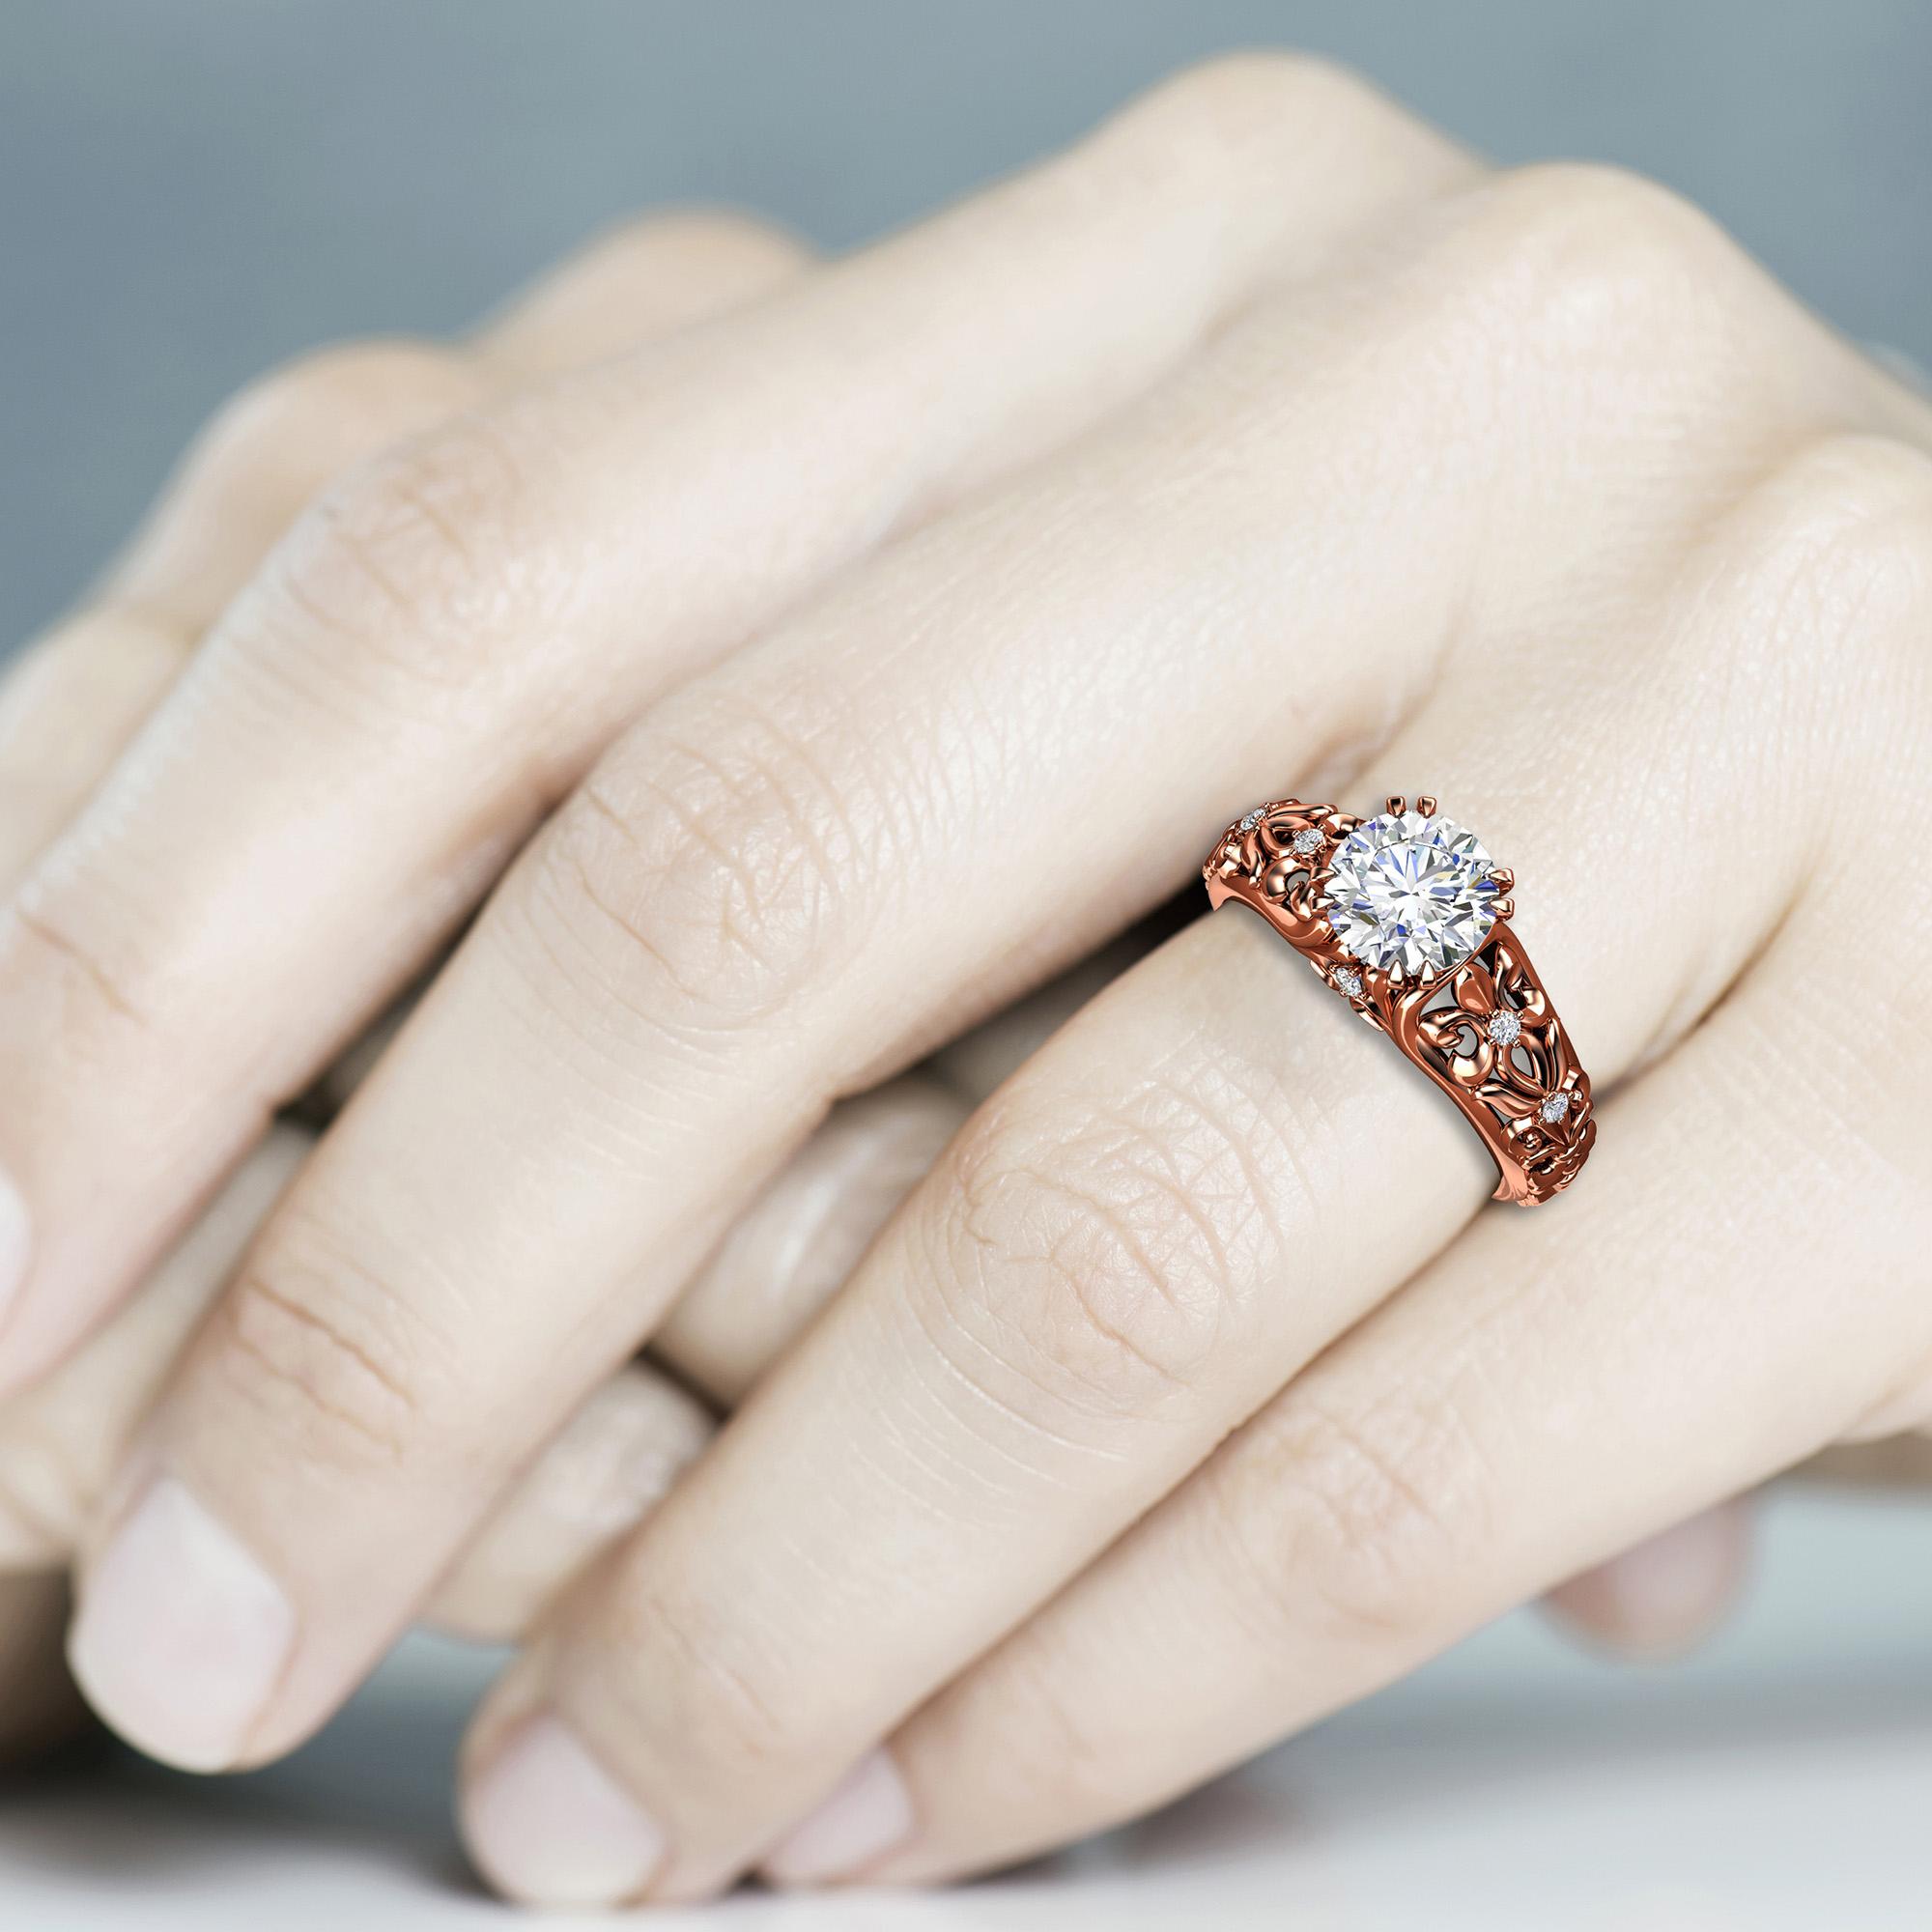 Art Nouveau Moissanite Ring Rose Gold Lab Grown Diamond Engagement Ring Diamond Alternative Engagement Ring